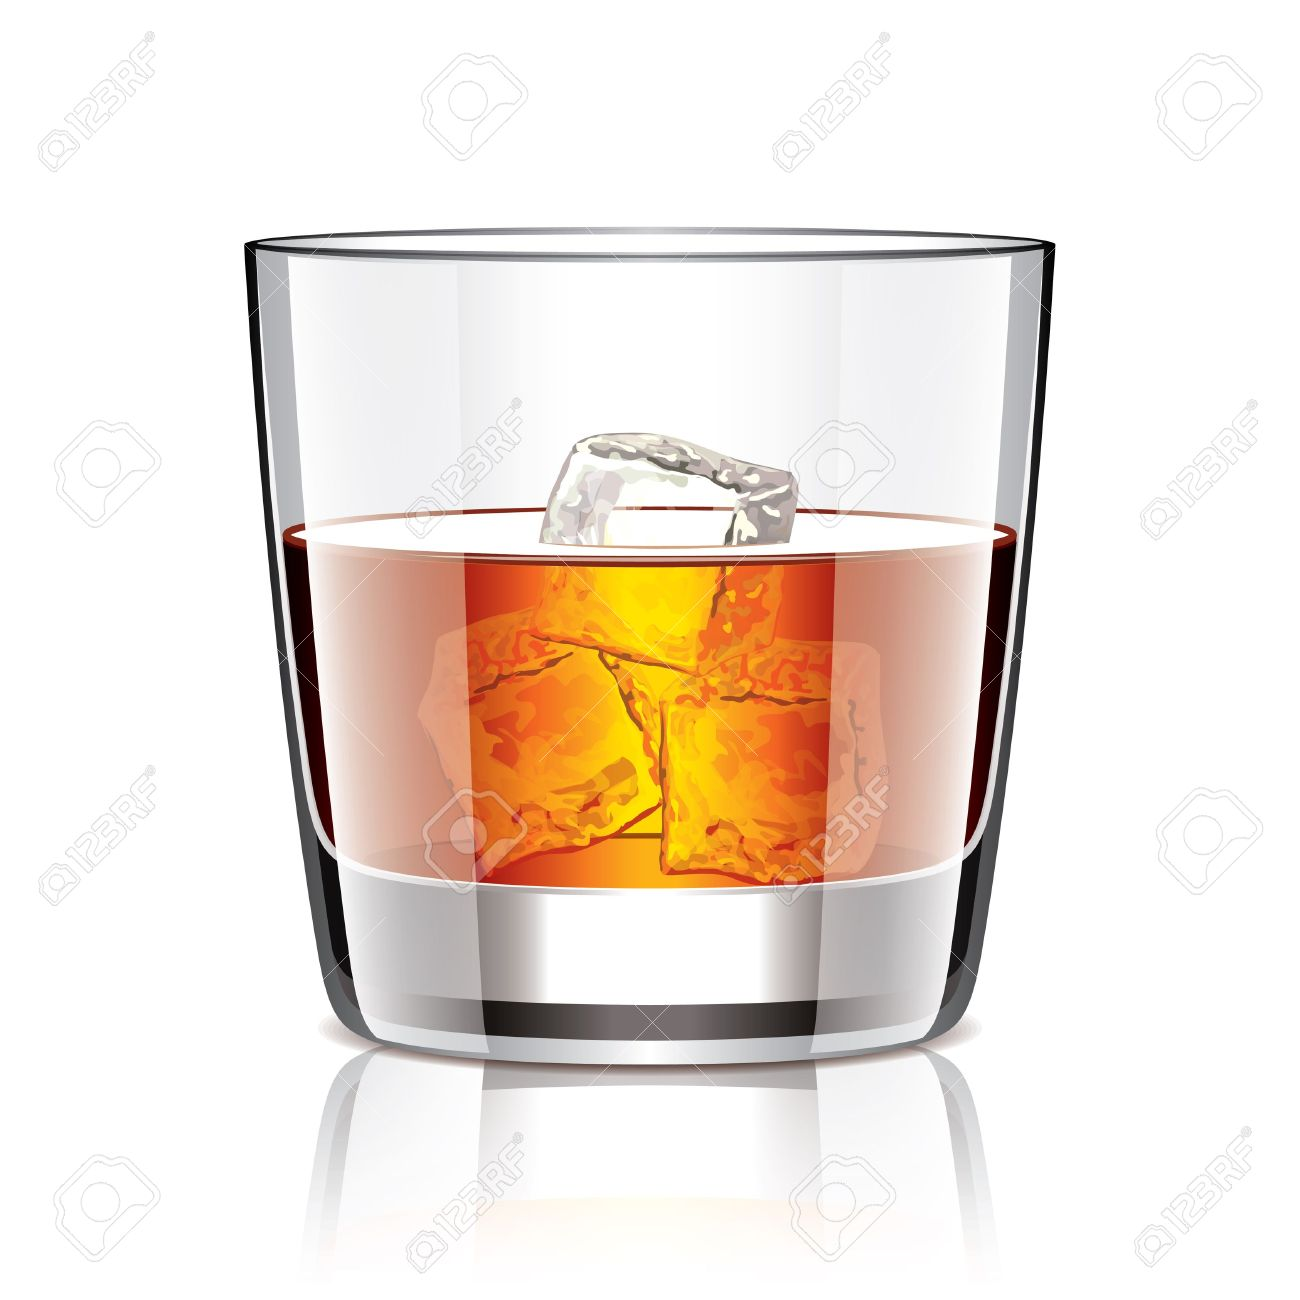 Whisky clipart scotch Whisky Whisky Whisky > Free